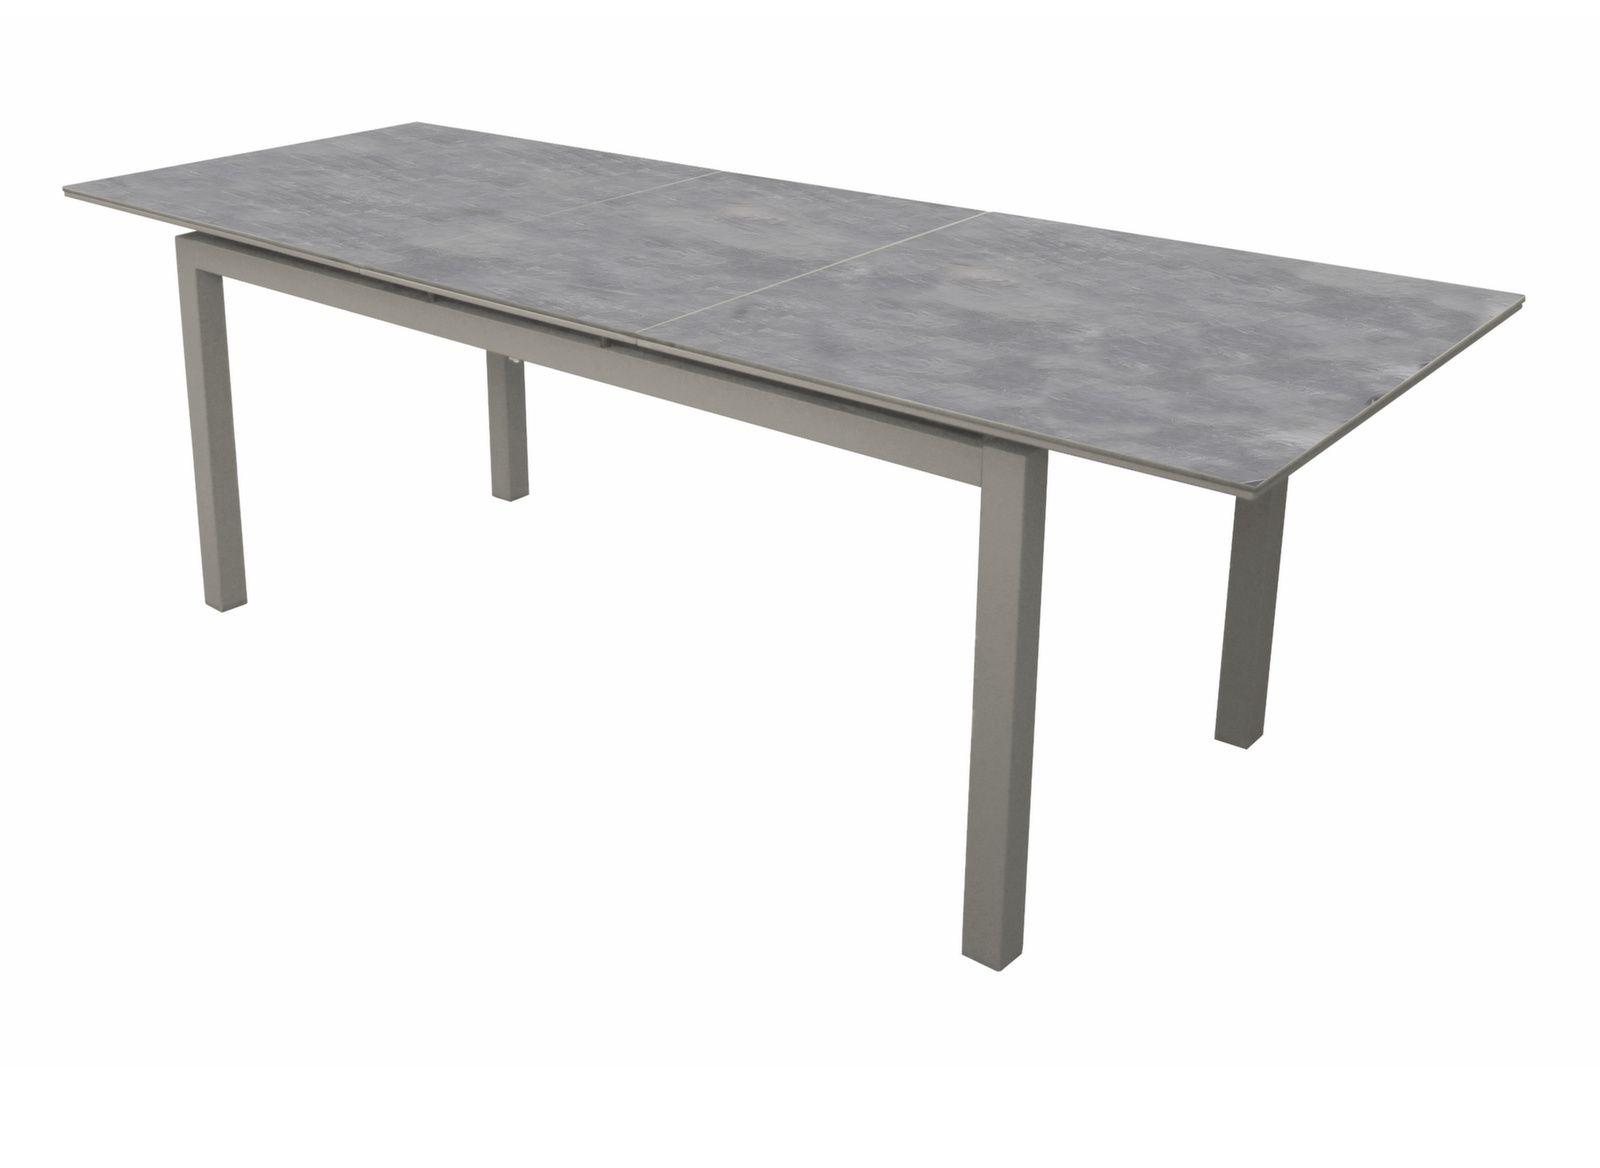 Table de jardin soto 180 235cm plateau arpa aliz for Plateau table 180